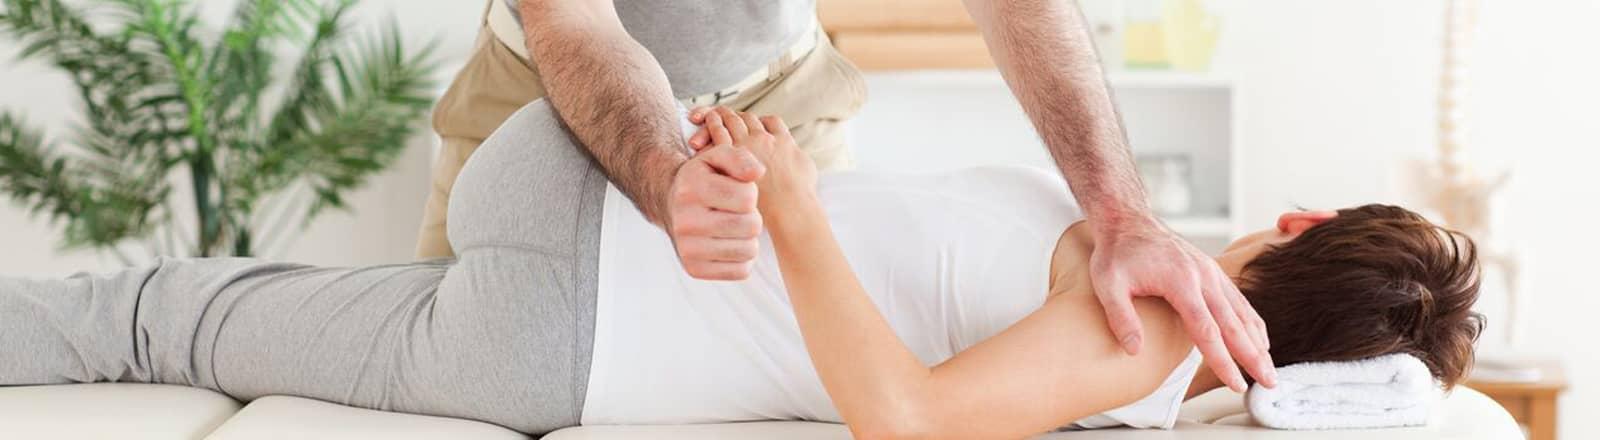 osteopatia estructural Logroño